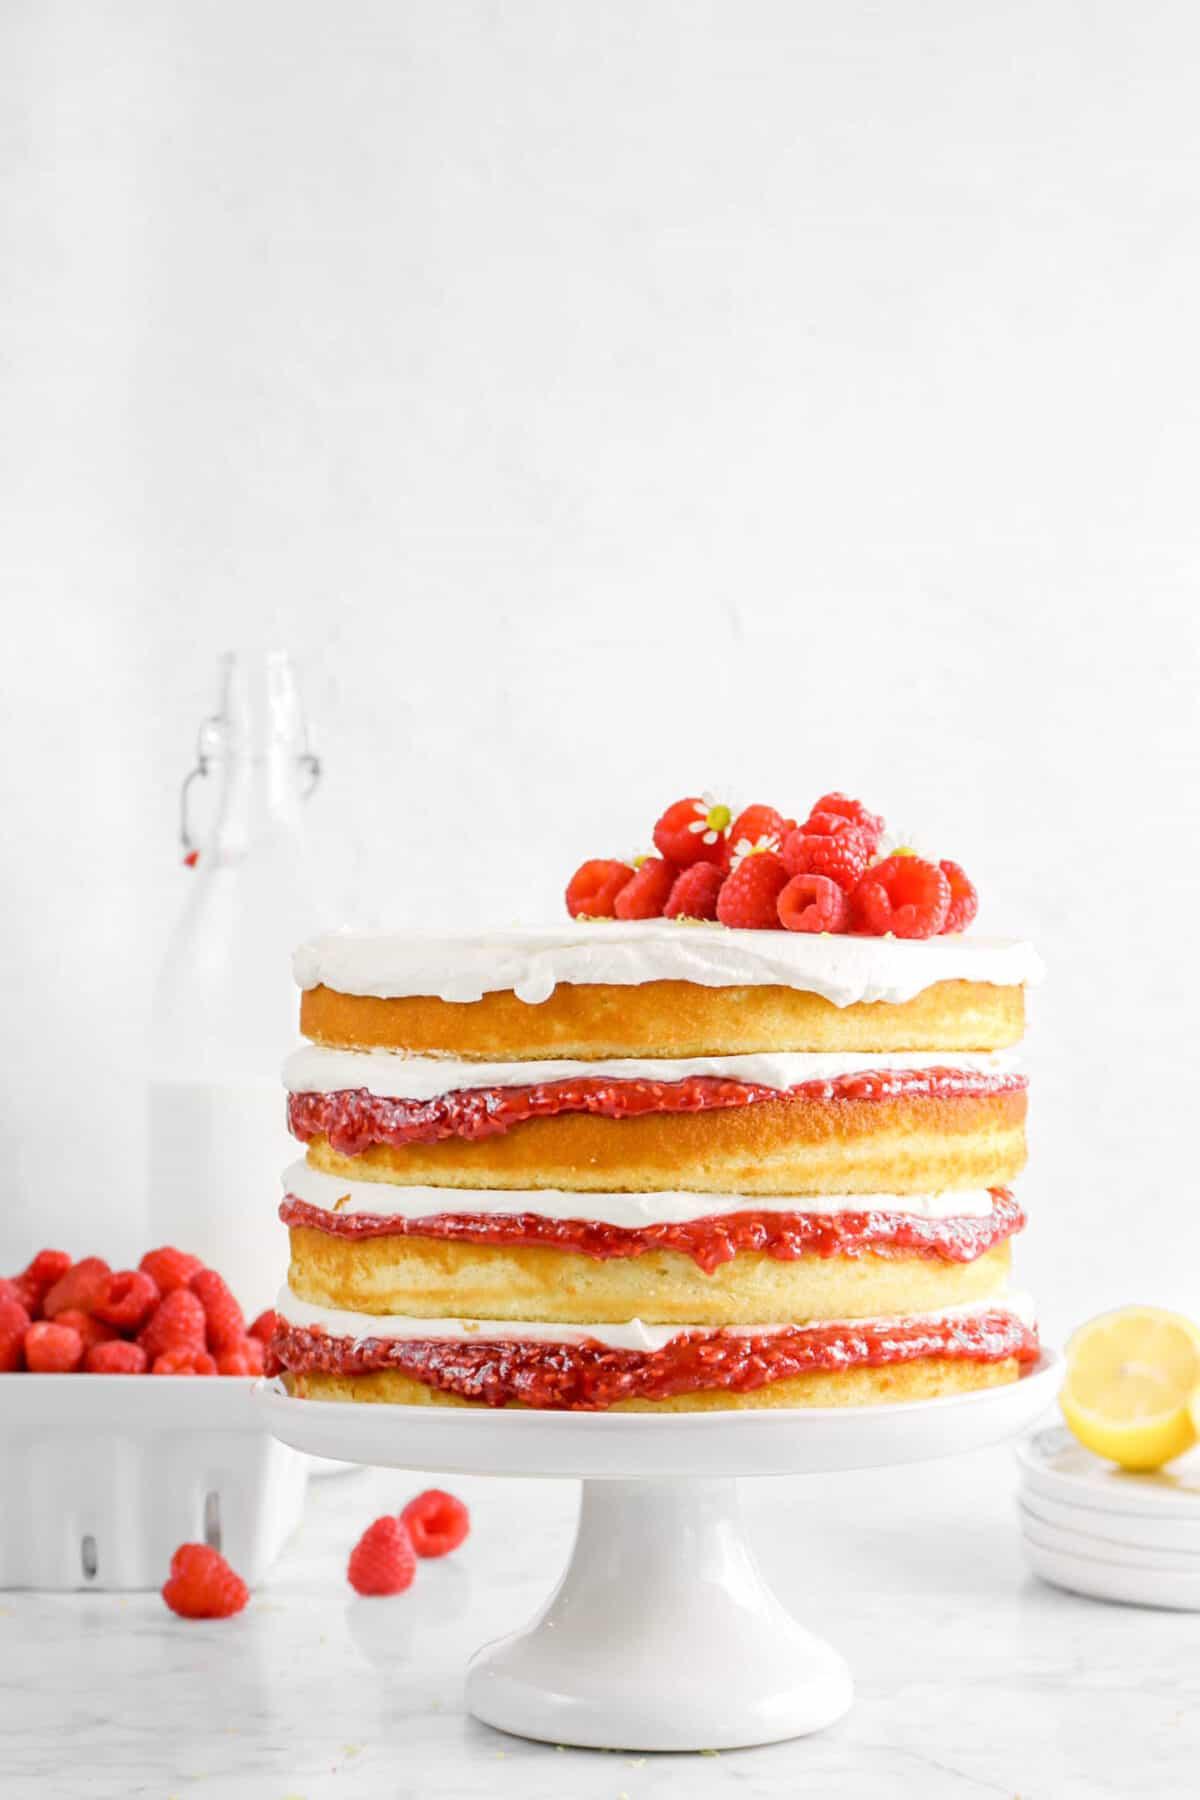 lemon raspberry cake on white cake plate with raspberries, lemon slice, and millk jug behind